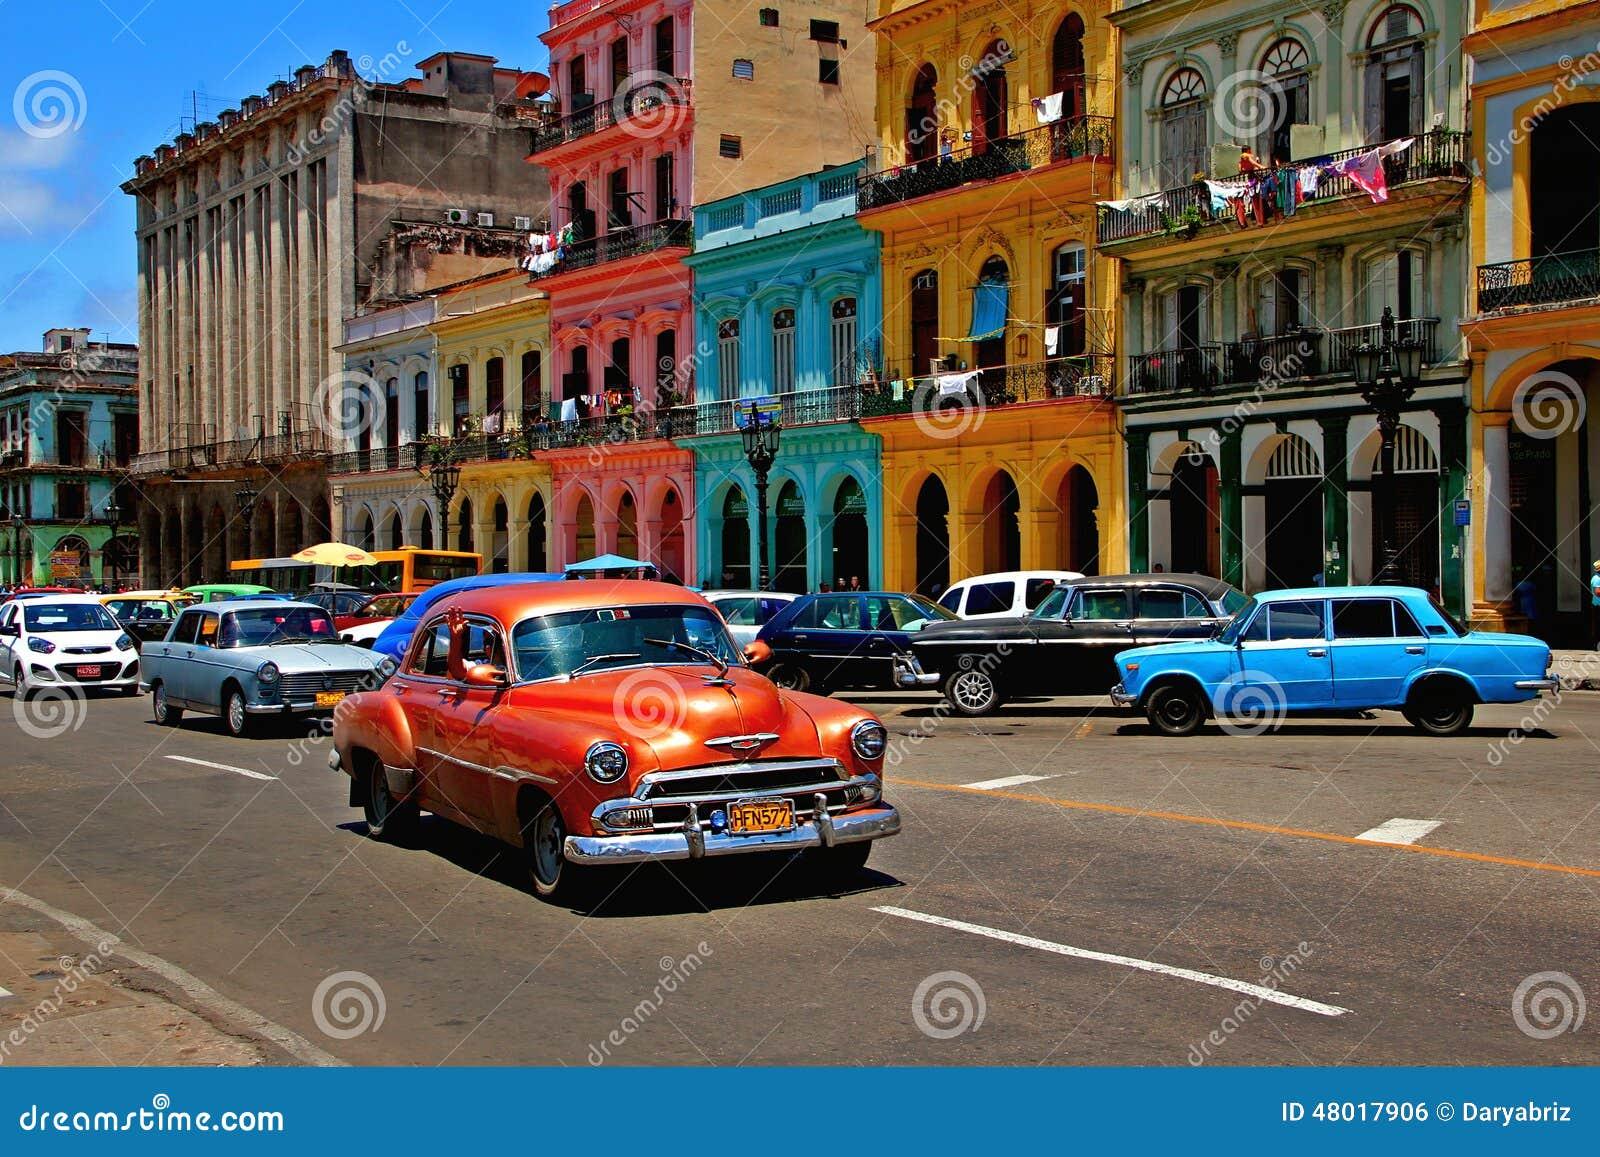 Old retro car in Havana, Cuba